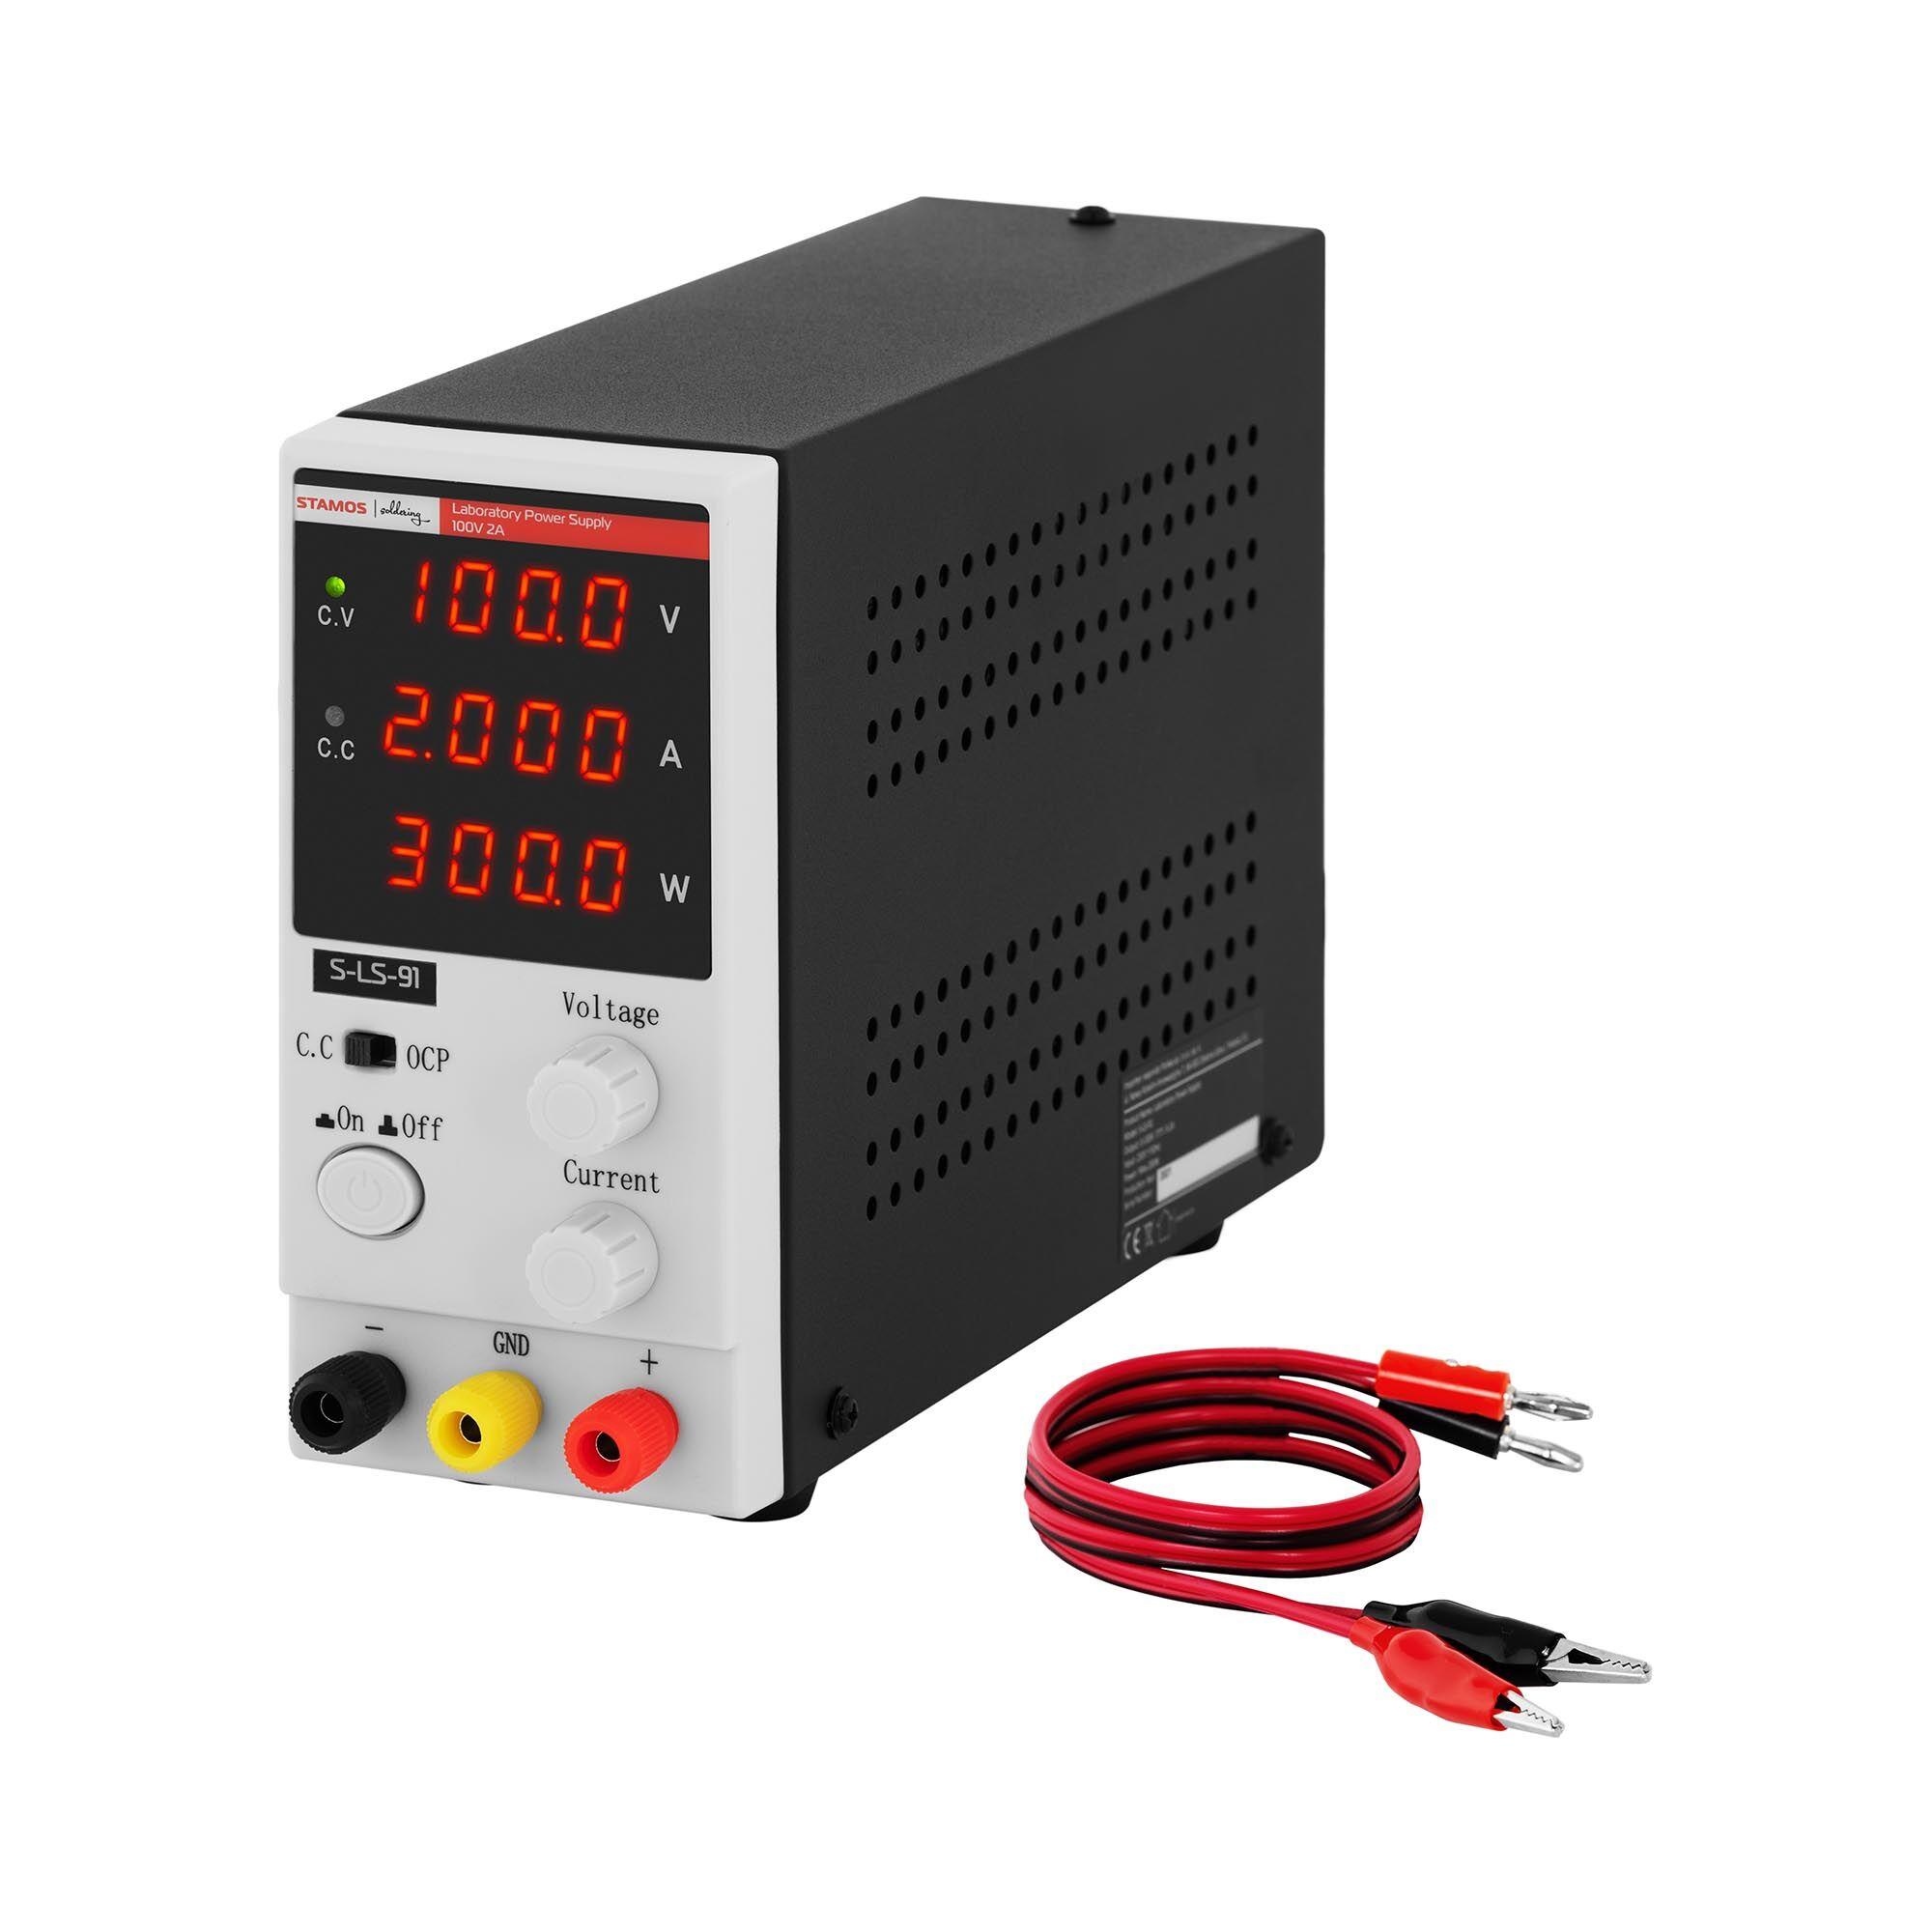 stamos soldering alimentatore da banco - 0 - 100 v - 0 - 2 a cc - 200 w - 4 cifre led - display s-ls-91